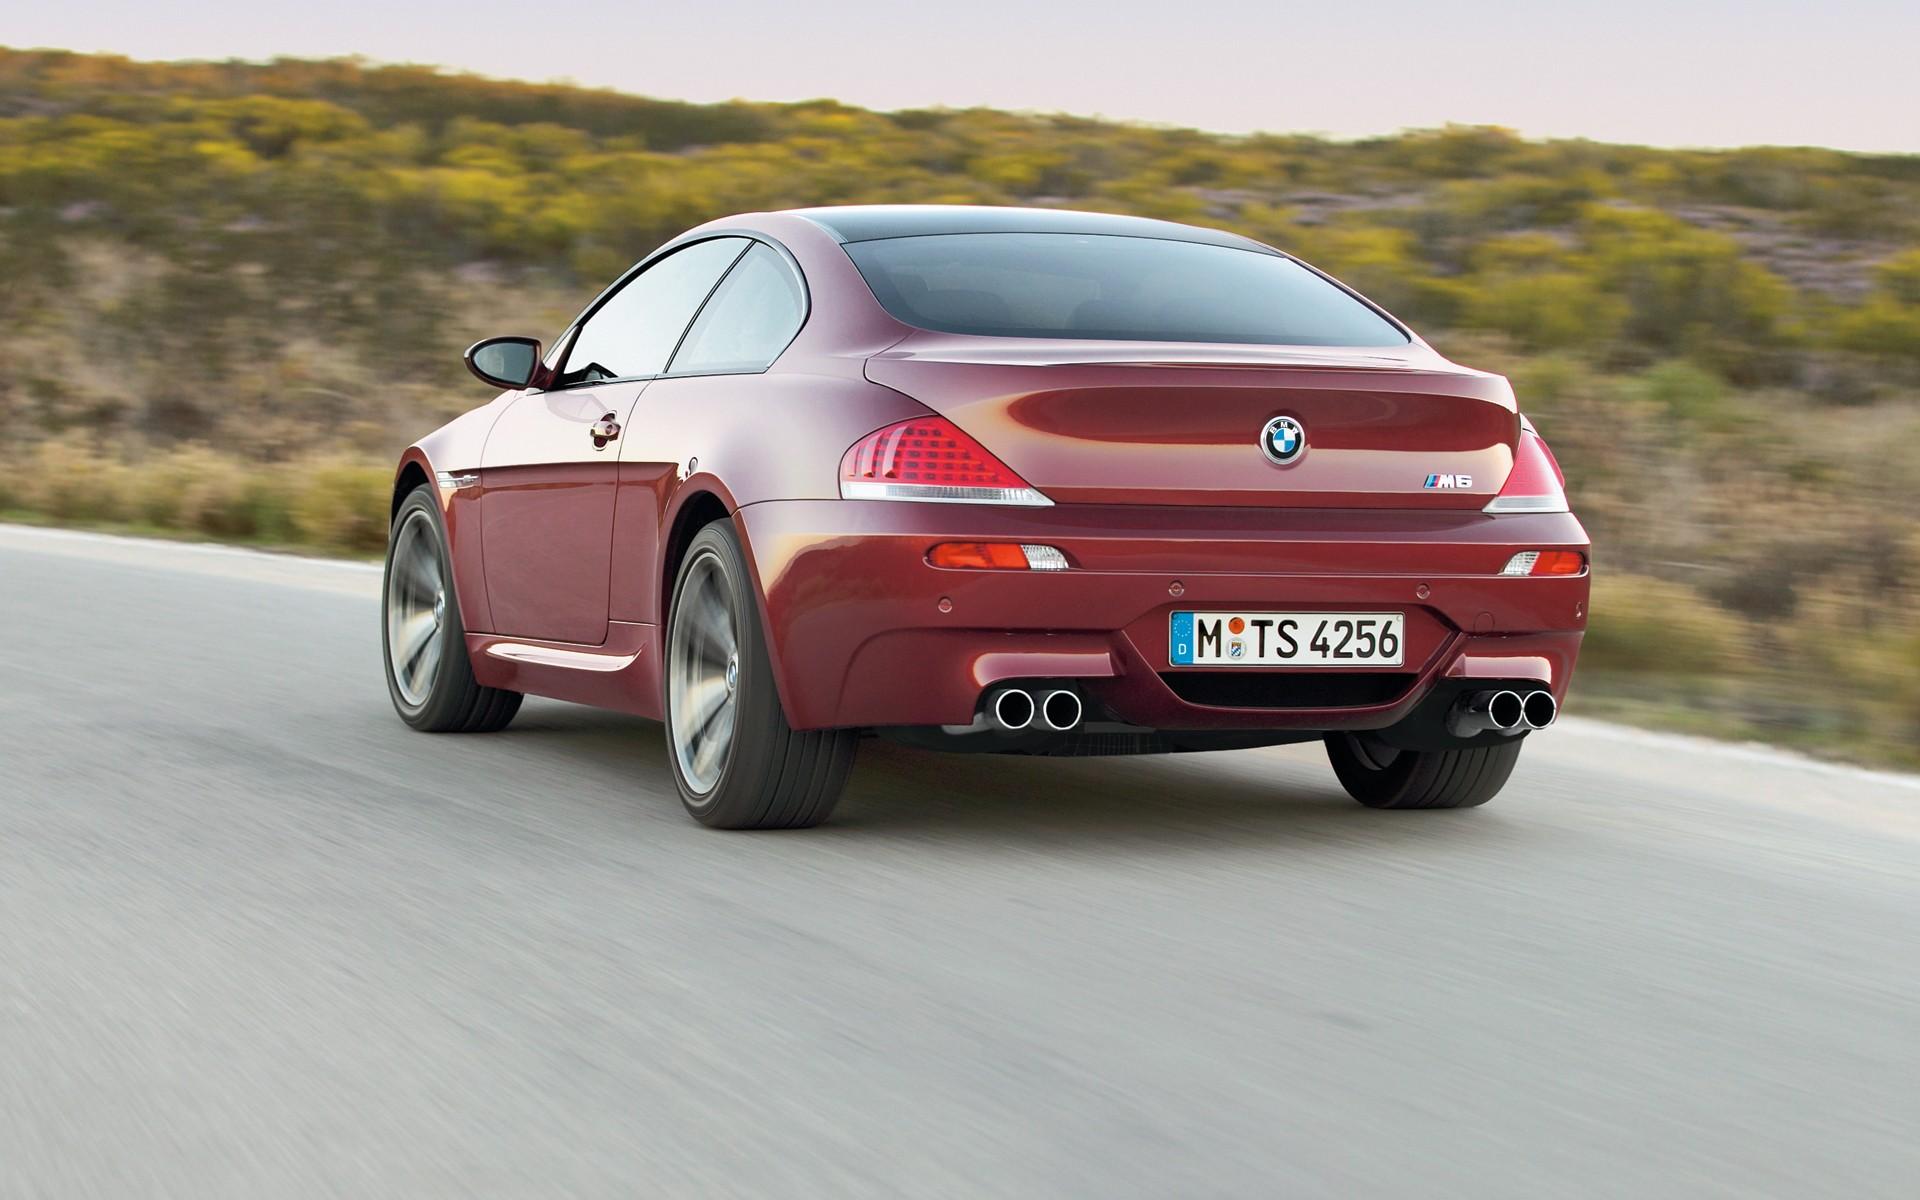 50+ BMW Cars Wallpapers for Desktop on WallpaperSafari